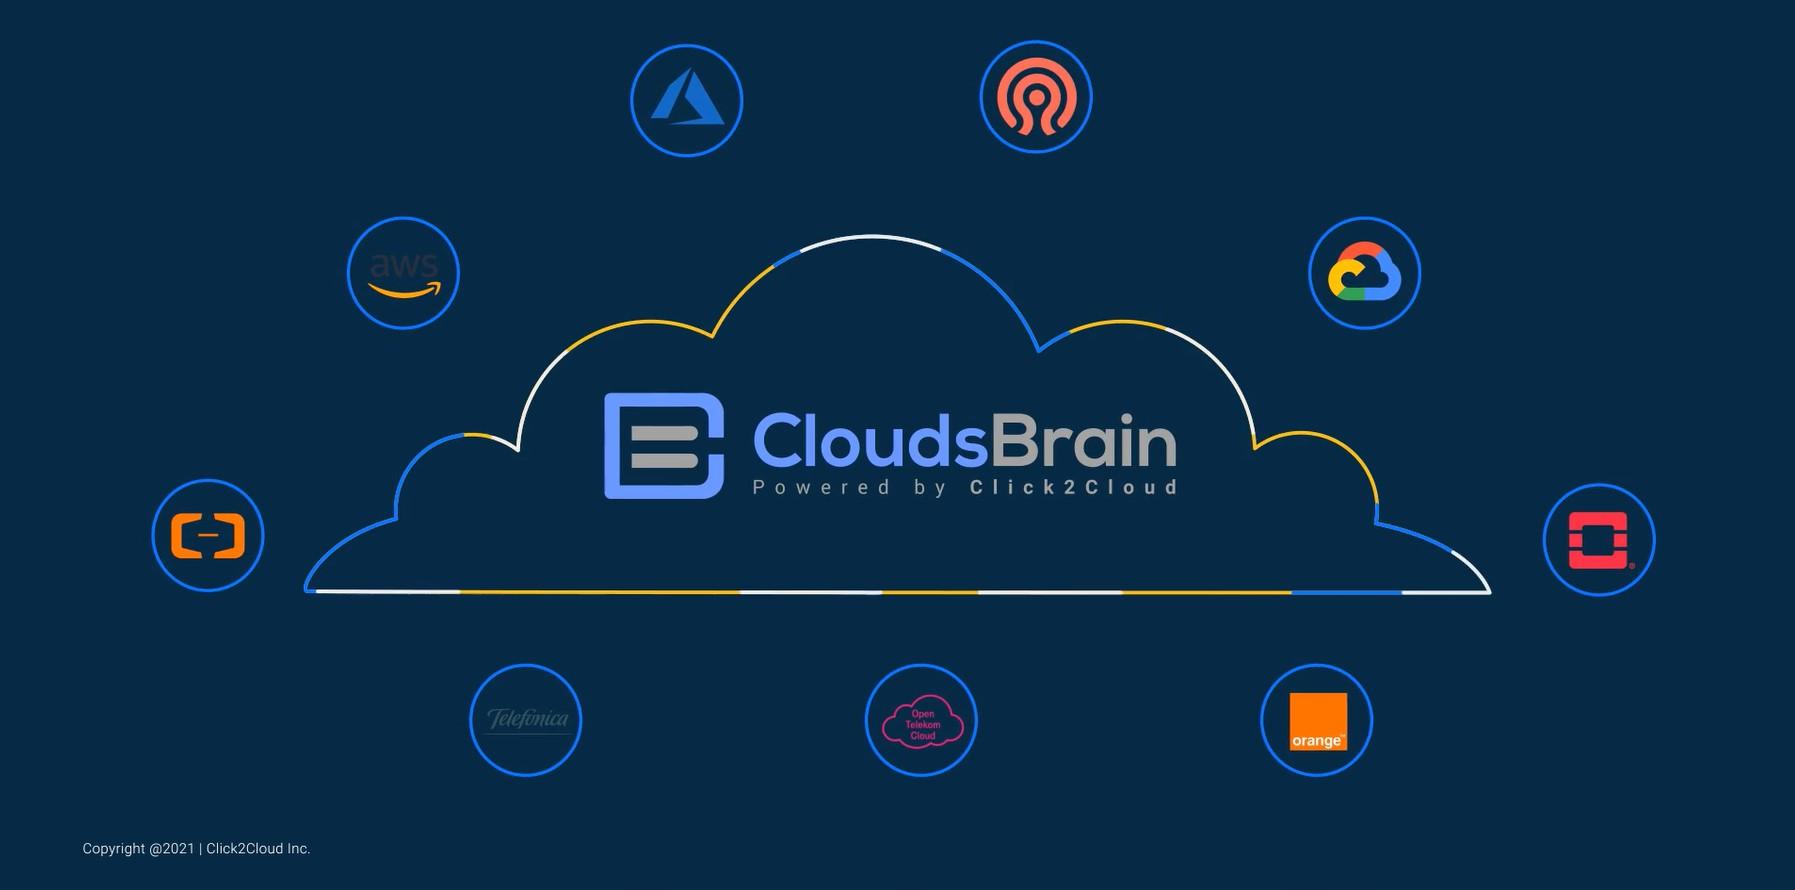 Click2cloud_Migrate your on-premise database to Azure cloud using CloudsBrain_Video